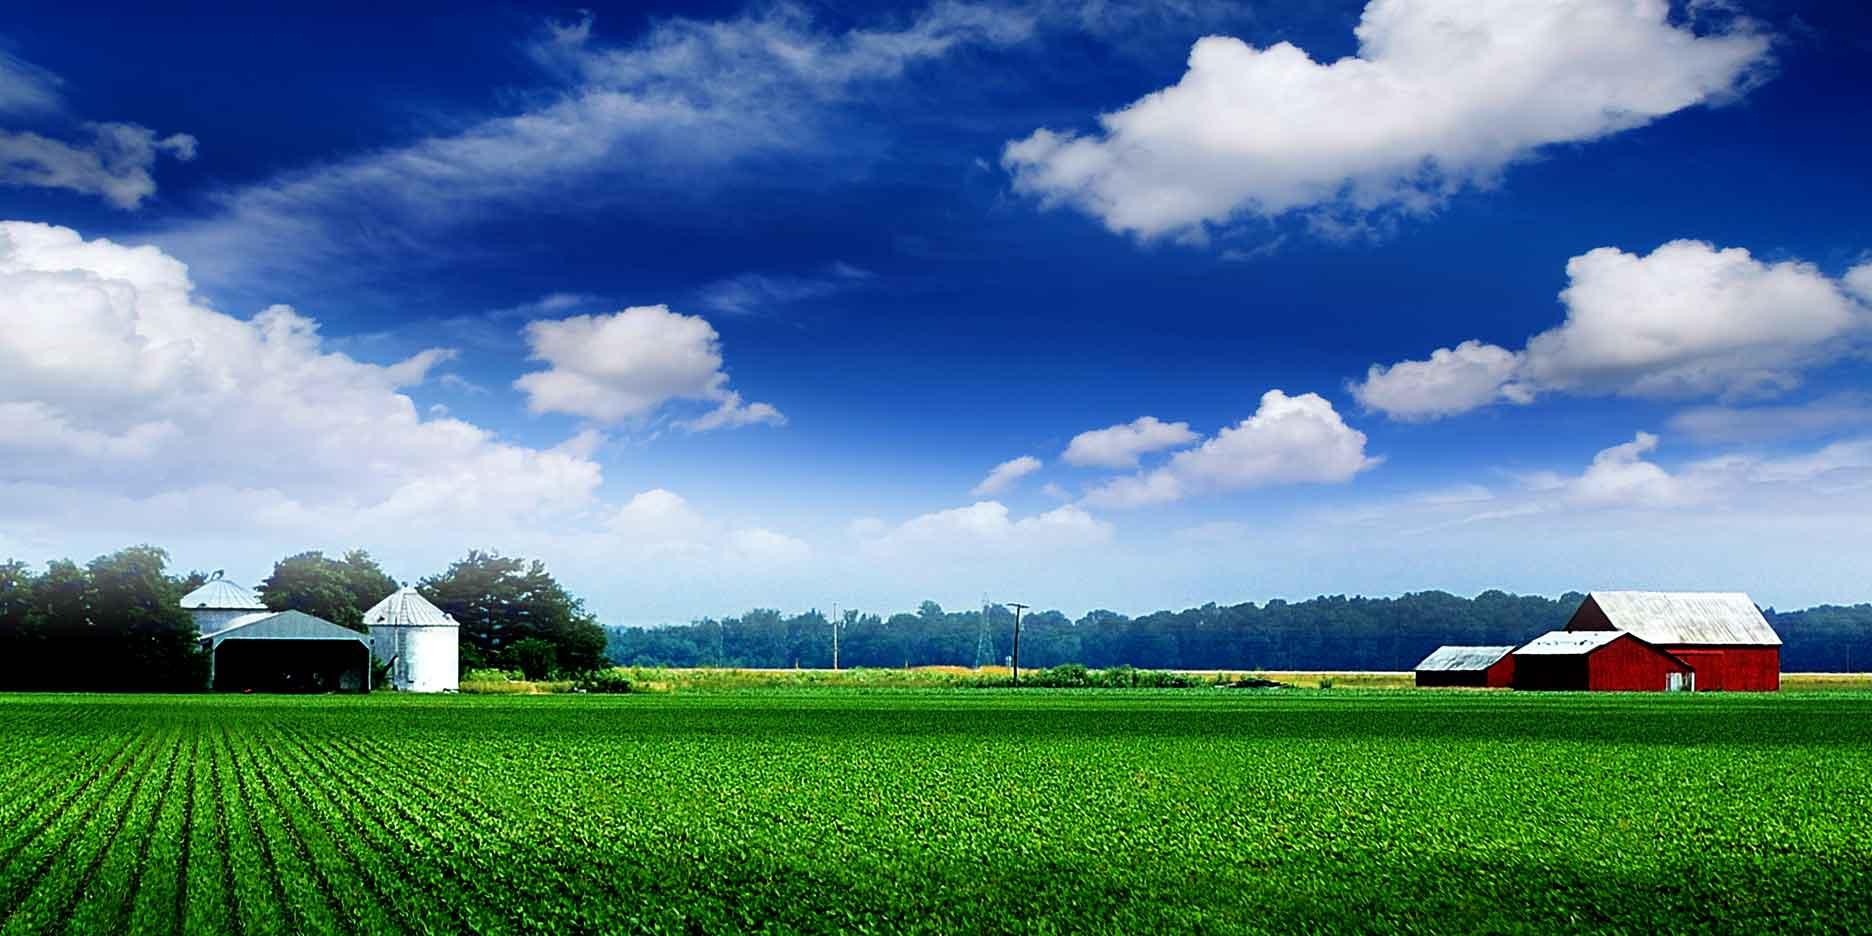 Farm Backgrounds Pictures 1872x936